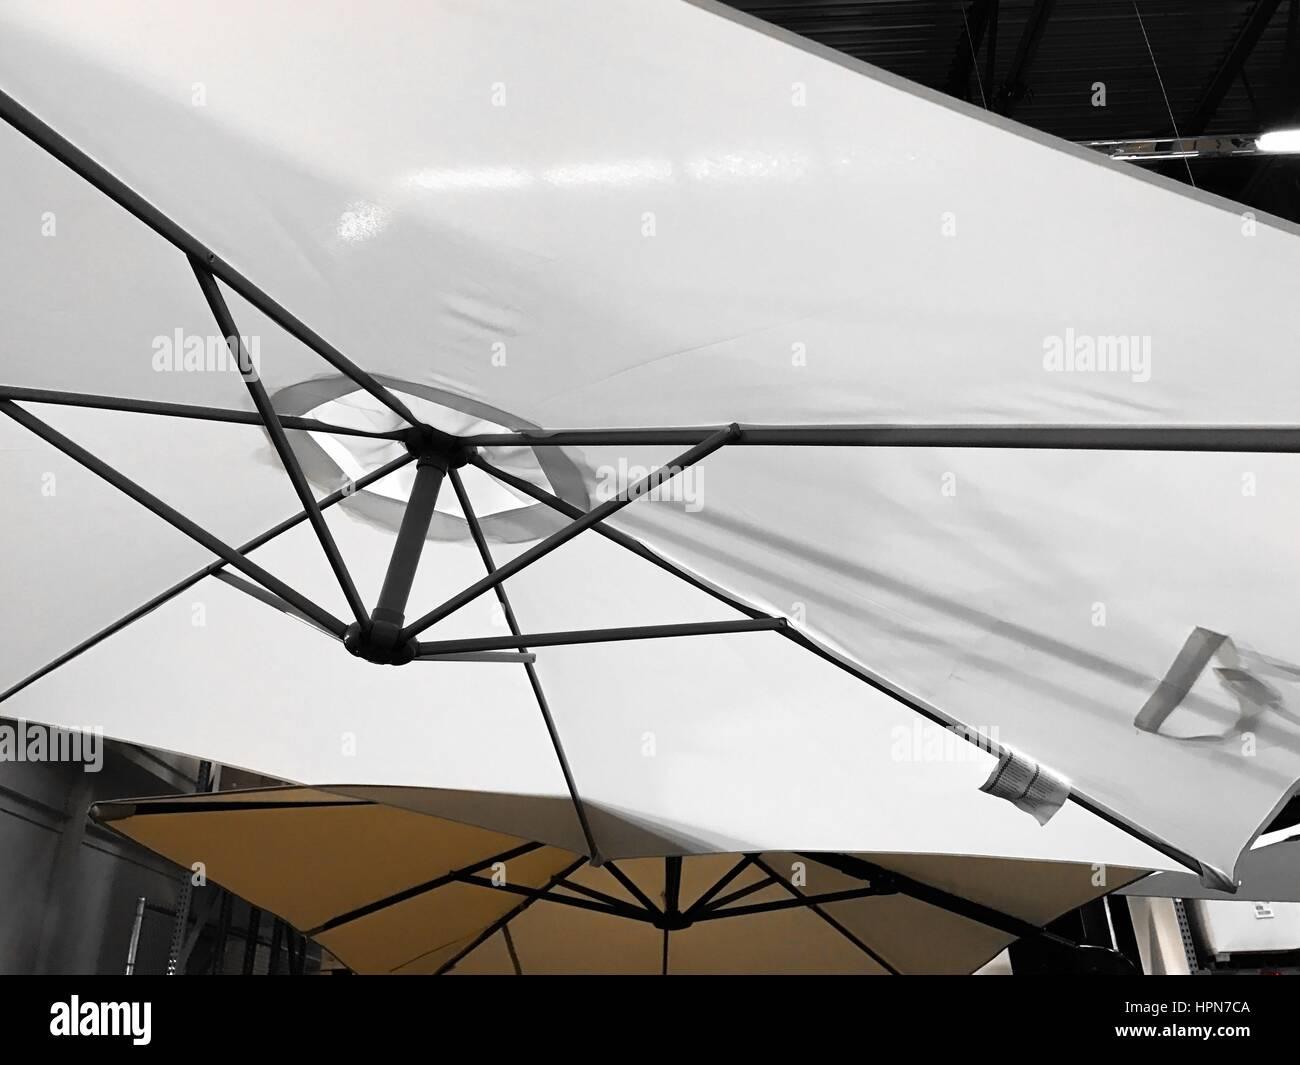 Parasols Stock Photo